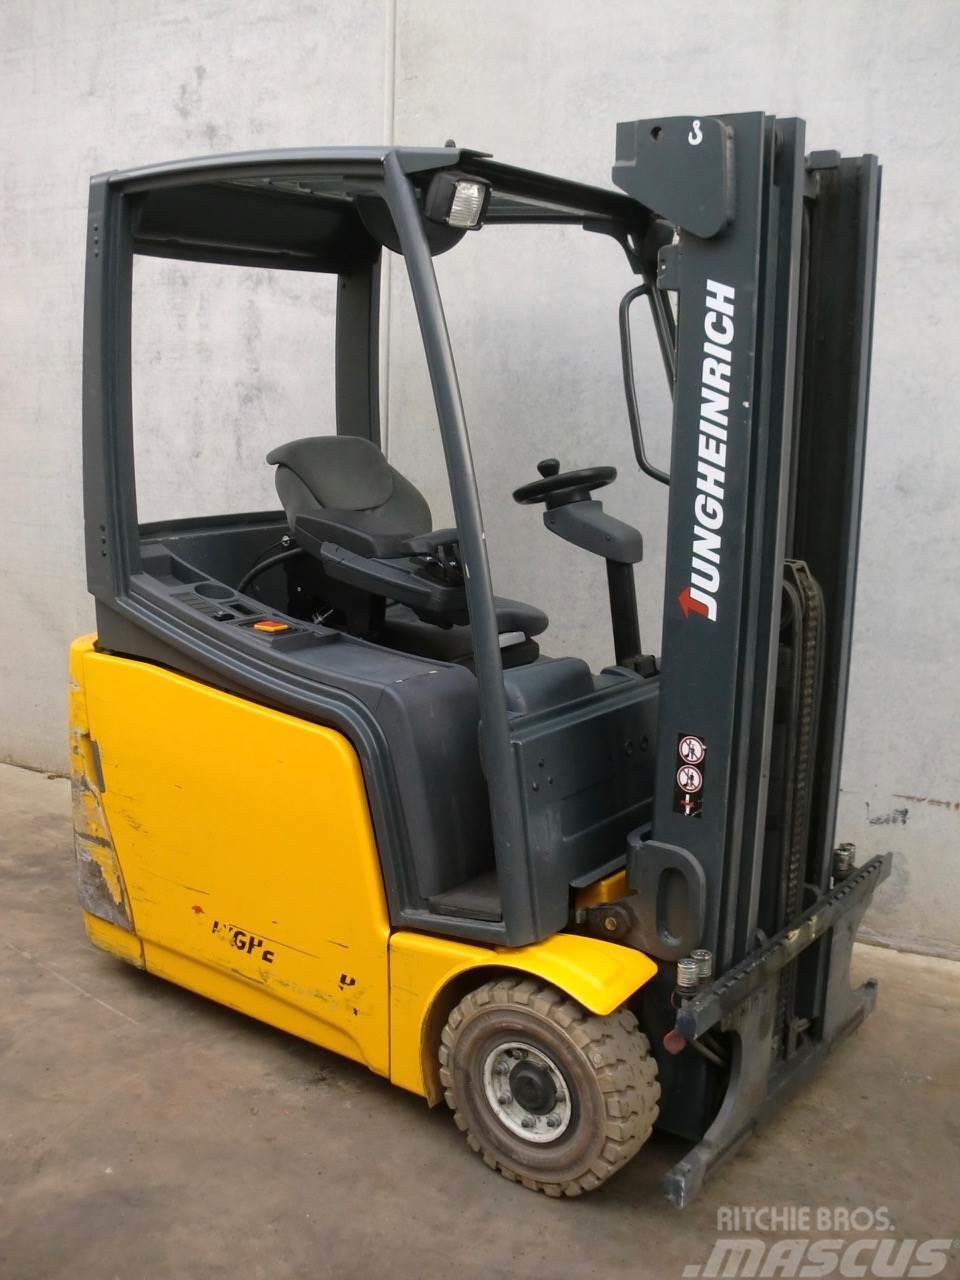 Electric Forklift Jungheinrich Erv308: Jungheinrich EFG 216k 450 DZ